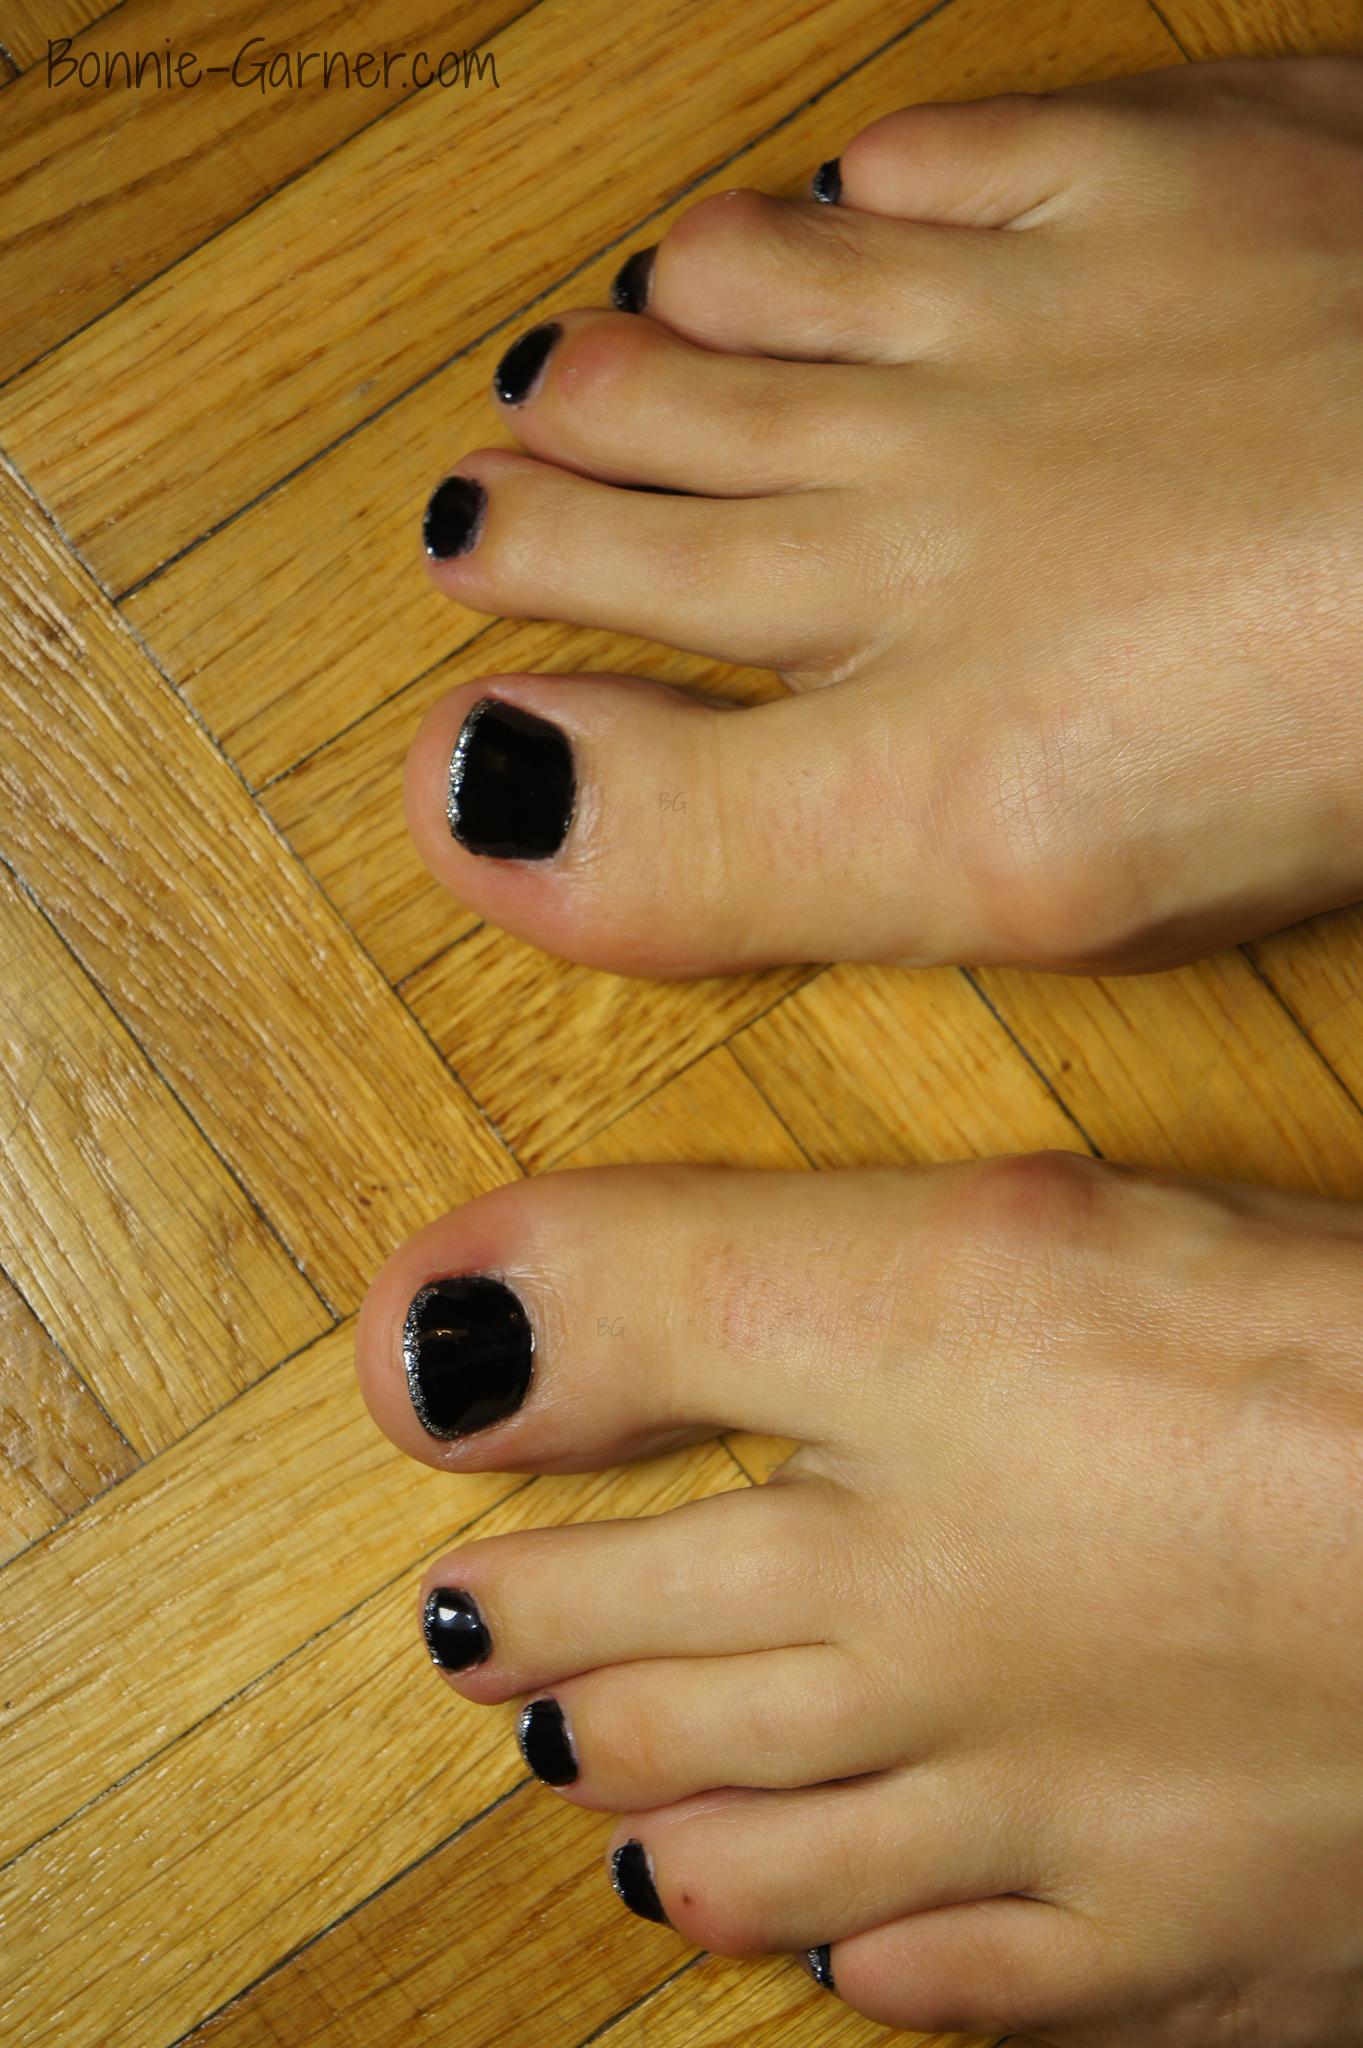 Vernis semi permanent et pon age attention danger bonnie garner soins ongles maquillage - Ongle en gel pied ...